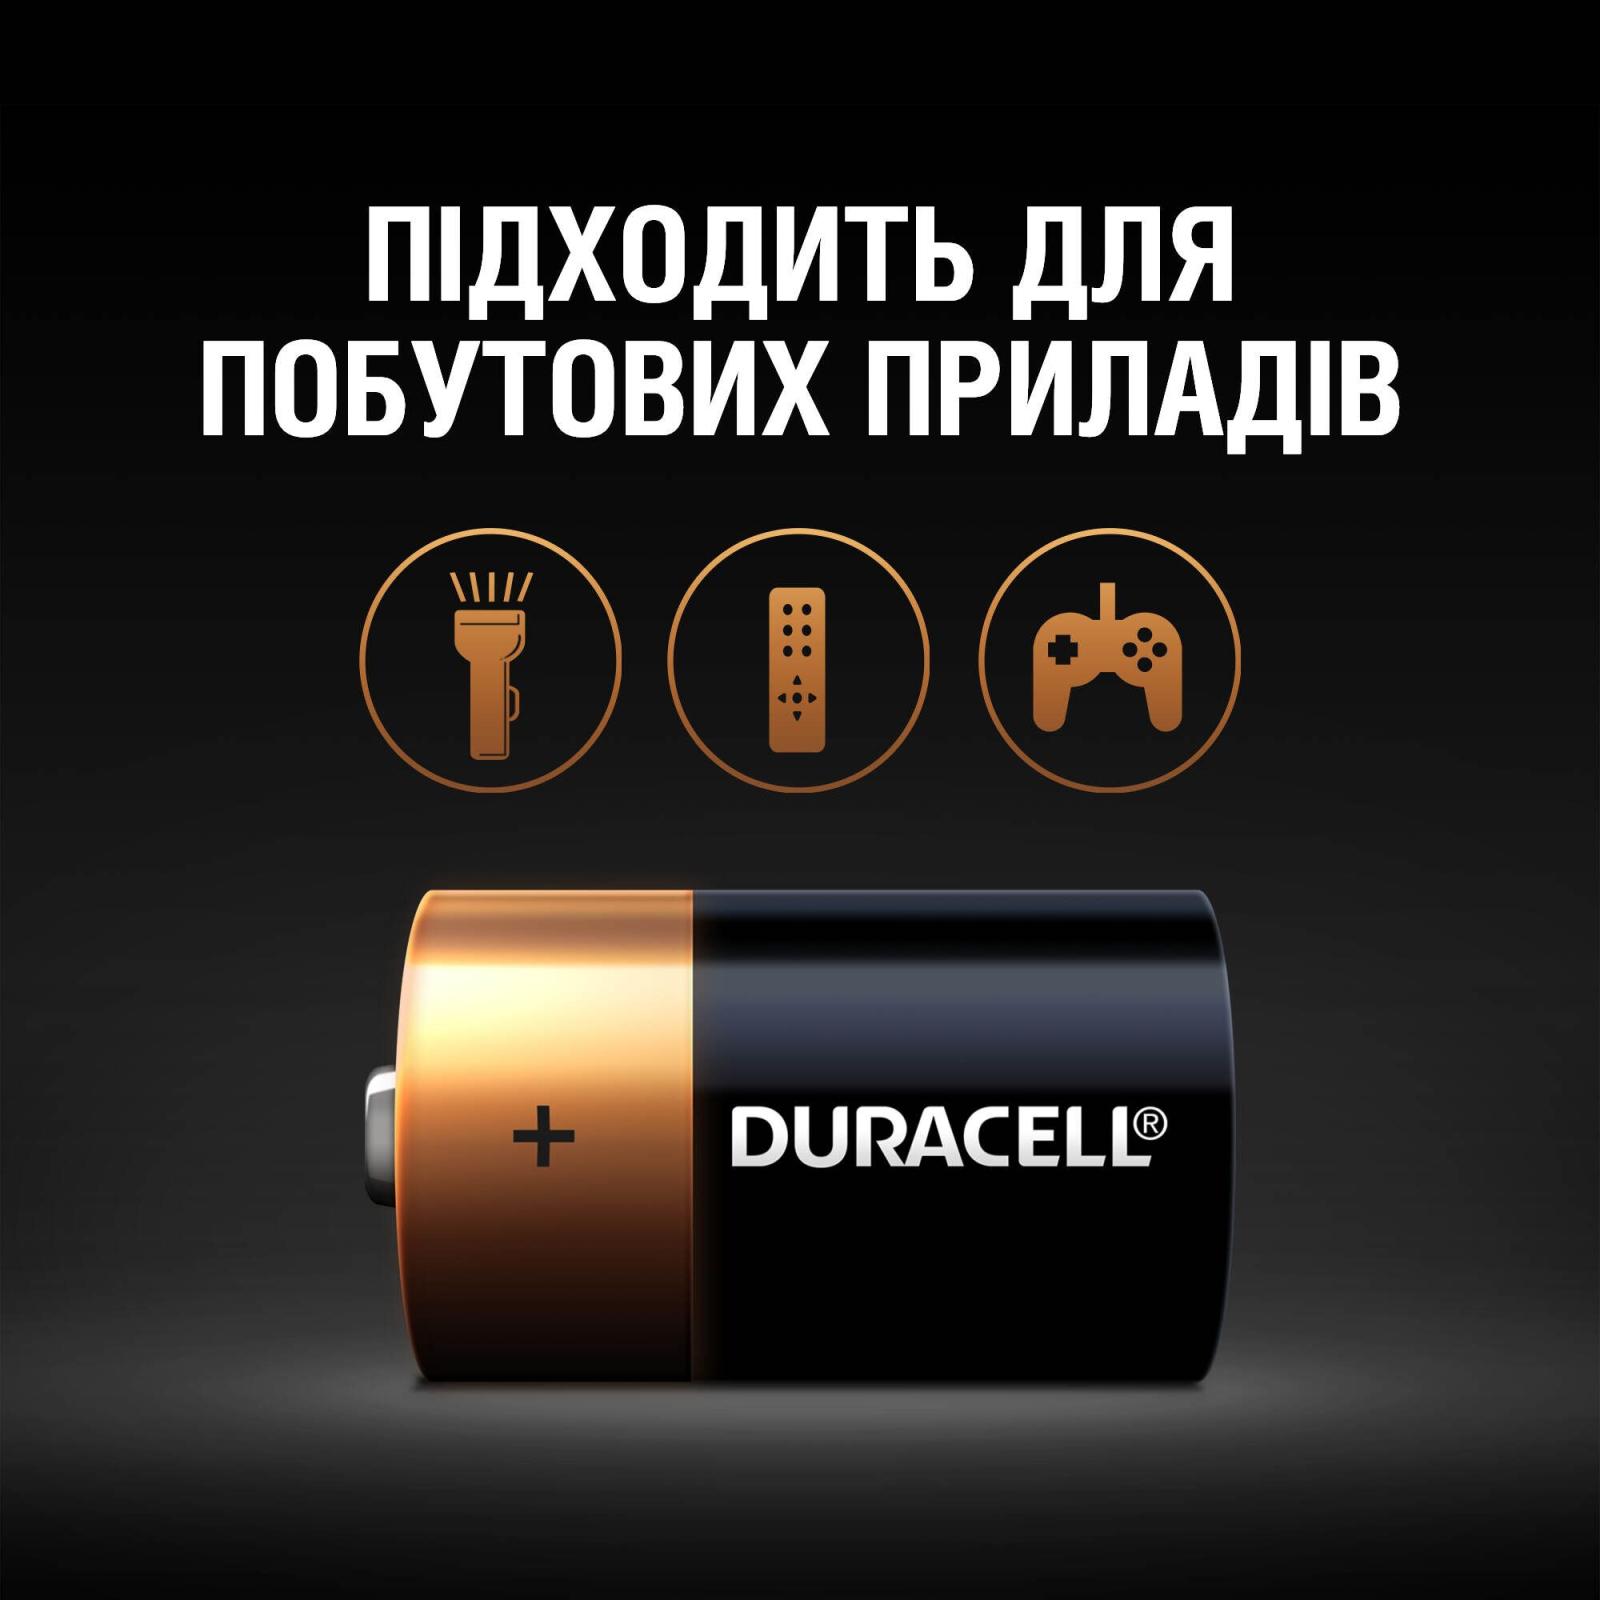 Батарейка Duracell D LR20 * 2 (5000394052512 / 81483648) изображение 5